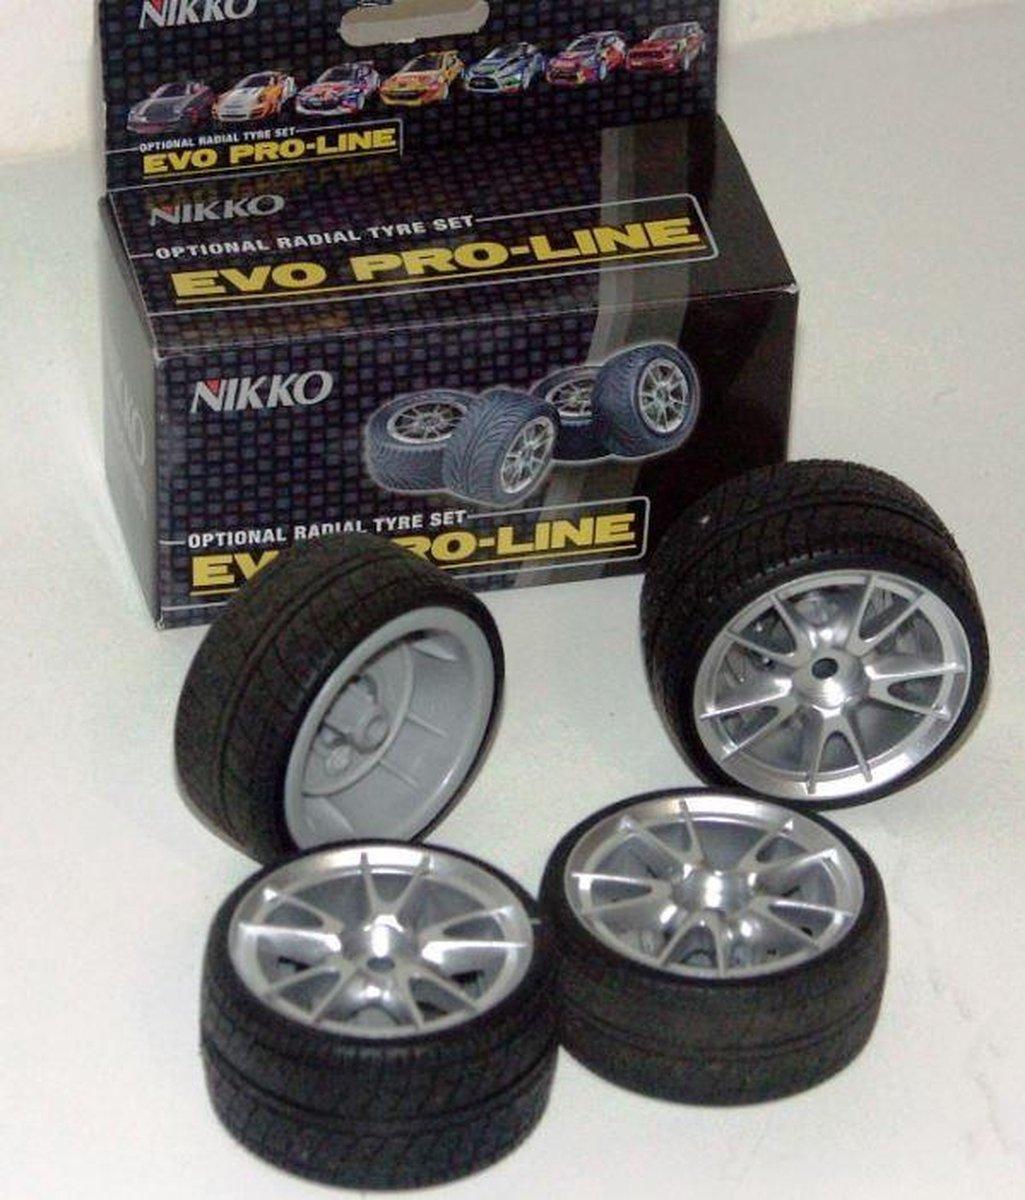 Nikko Evo Pro Line tyre-set